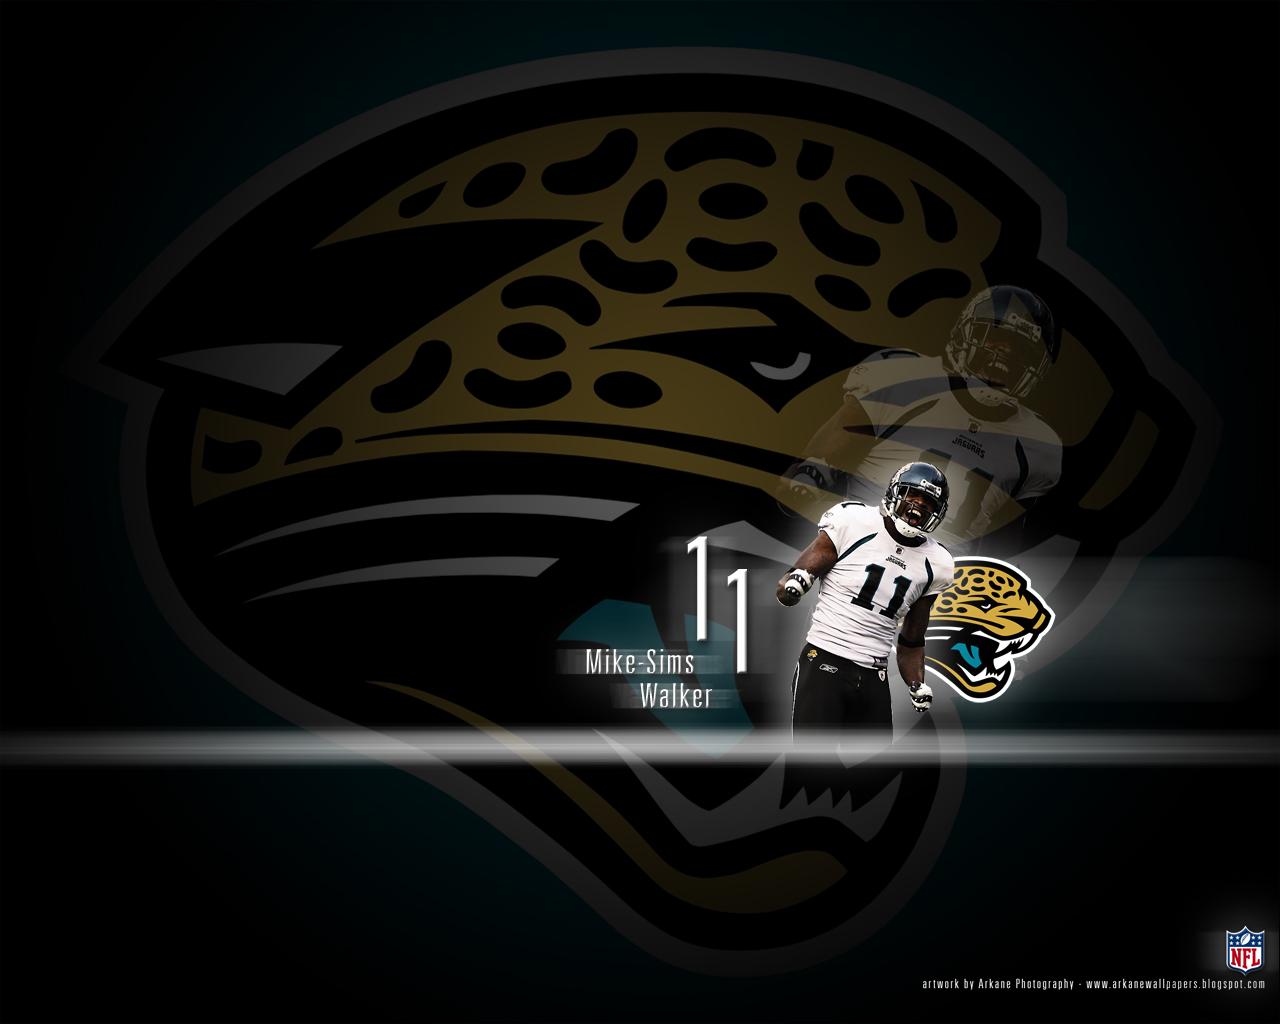 Arkane NFL Wallpapers Mike Sims Walker   Jacksonville Jaguars 1280x1024